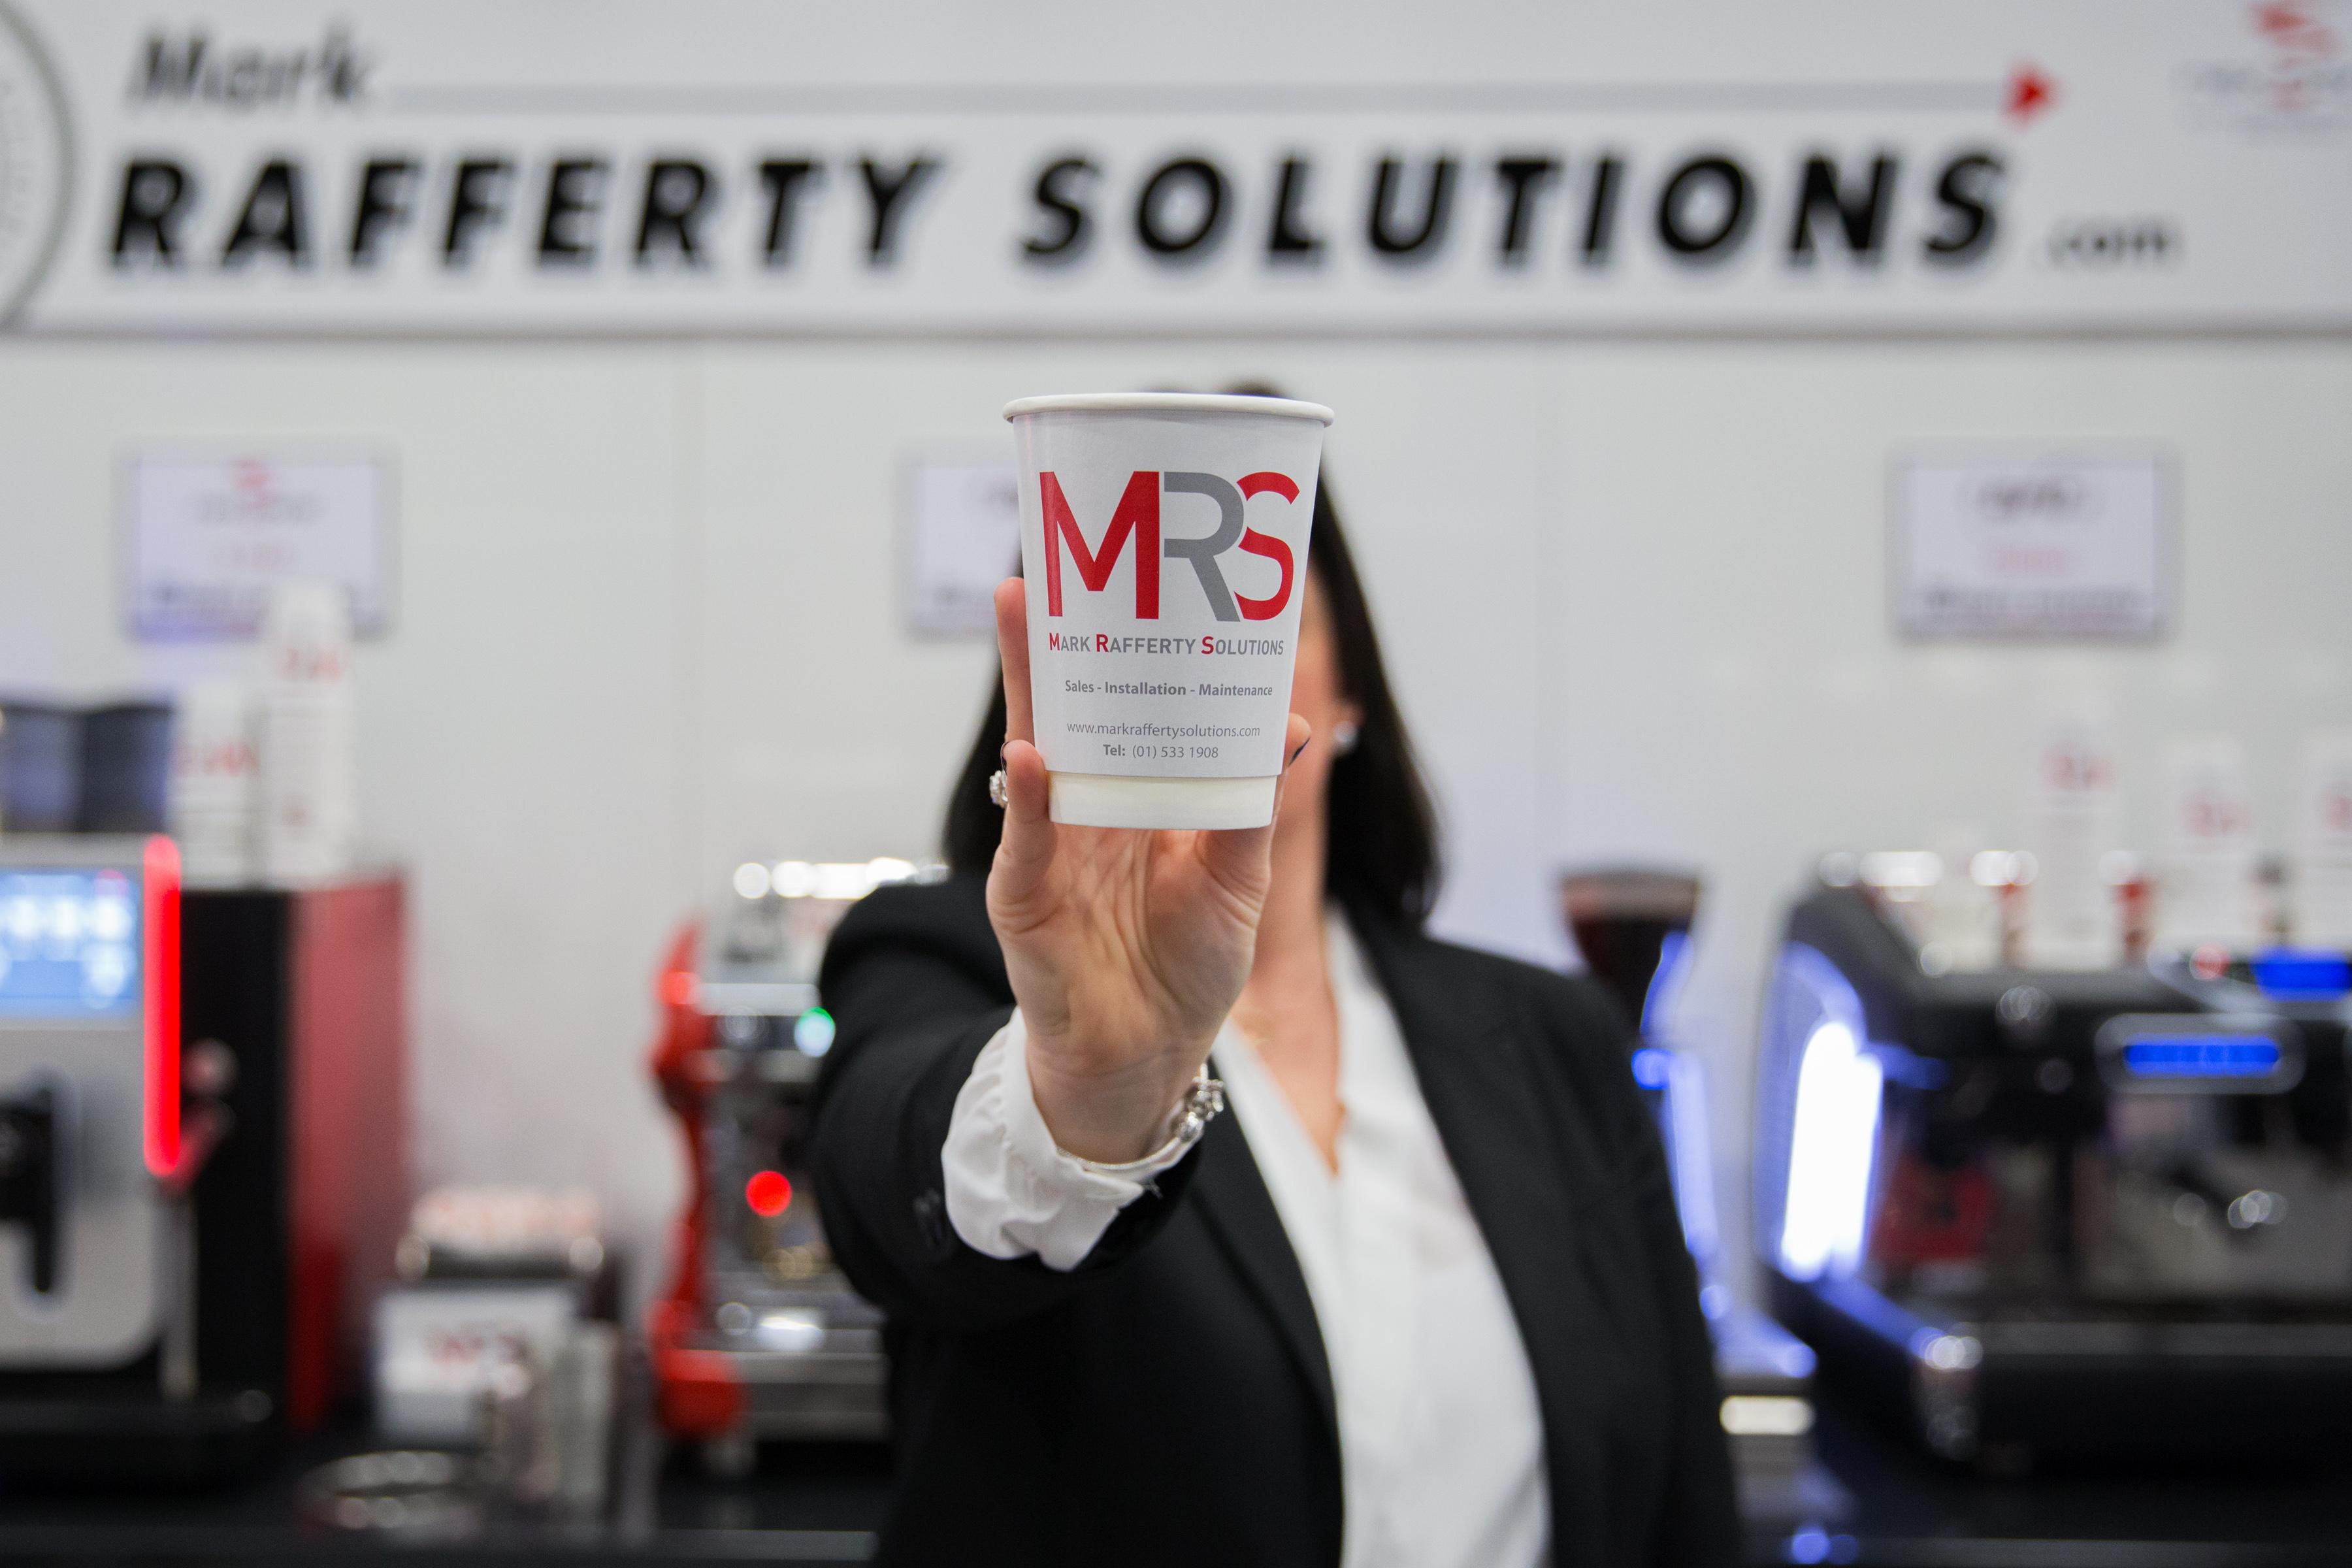 Mark Rafferty Solutions